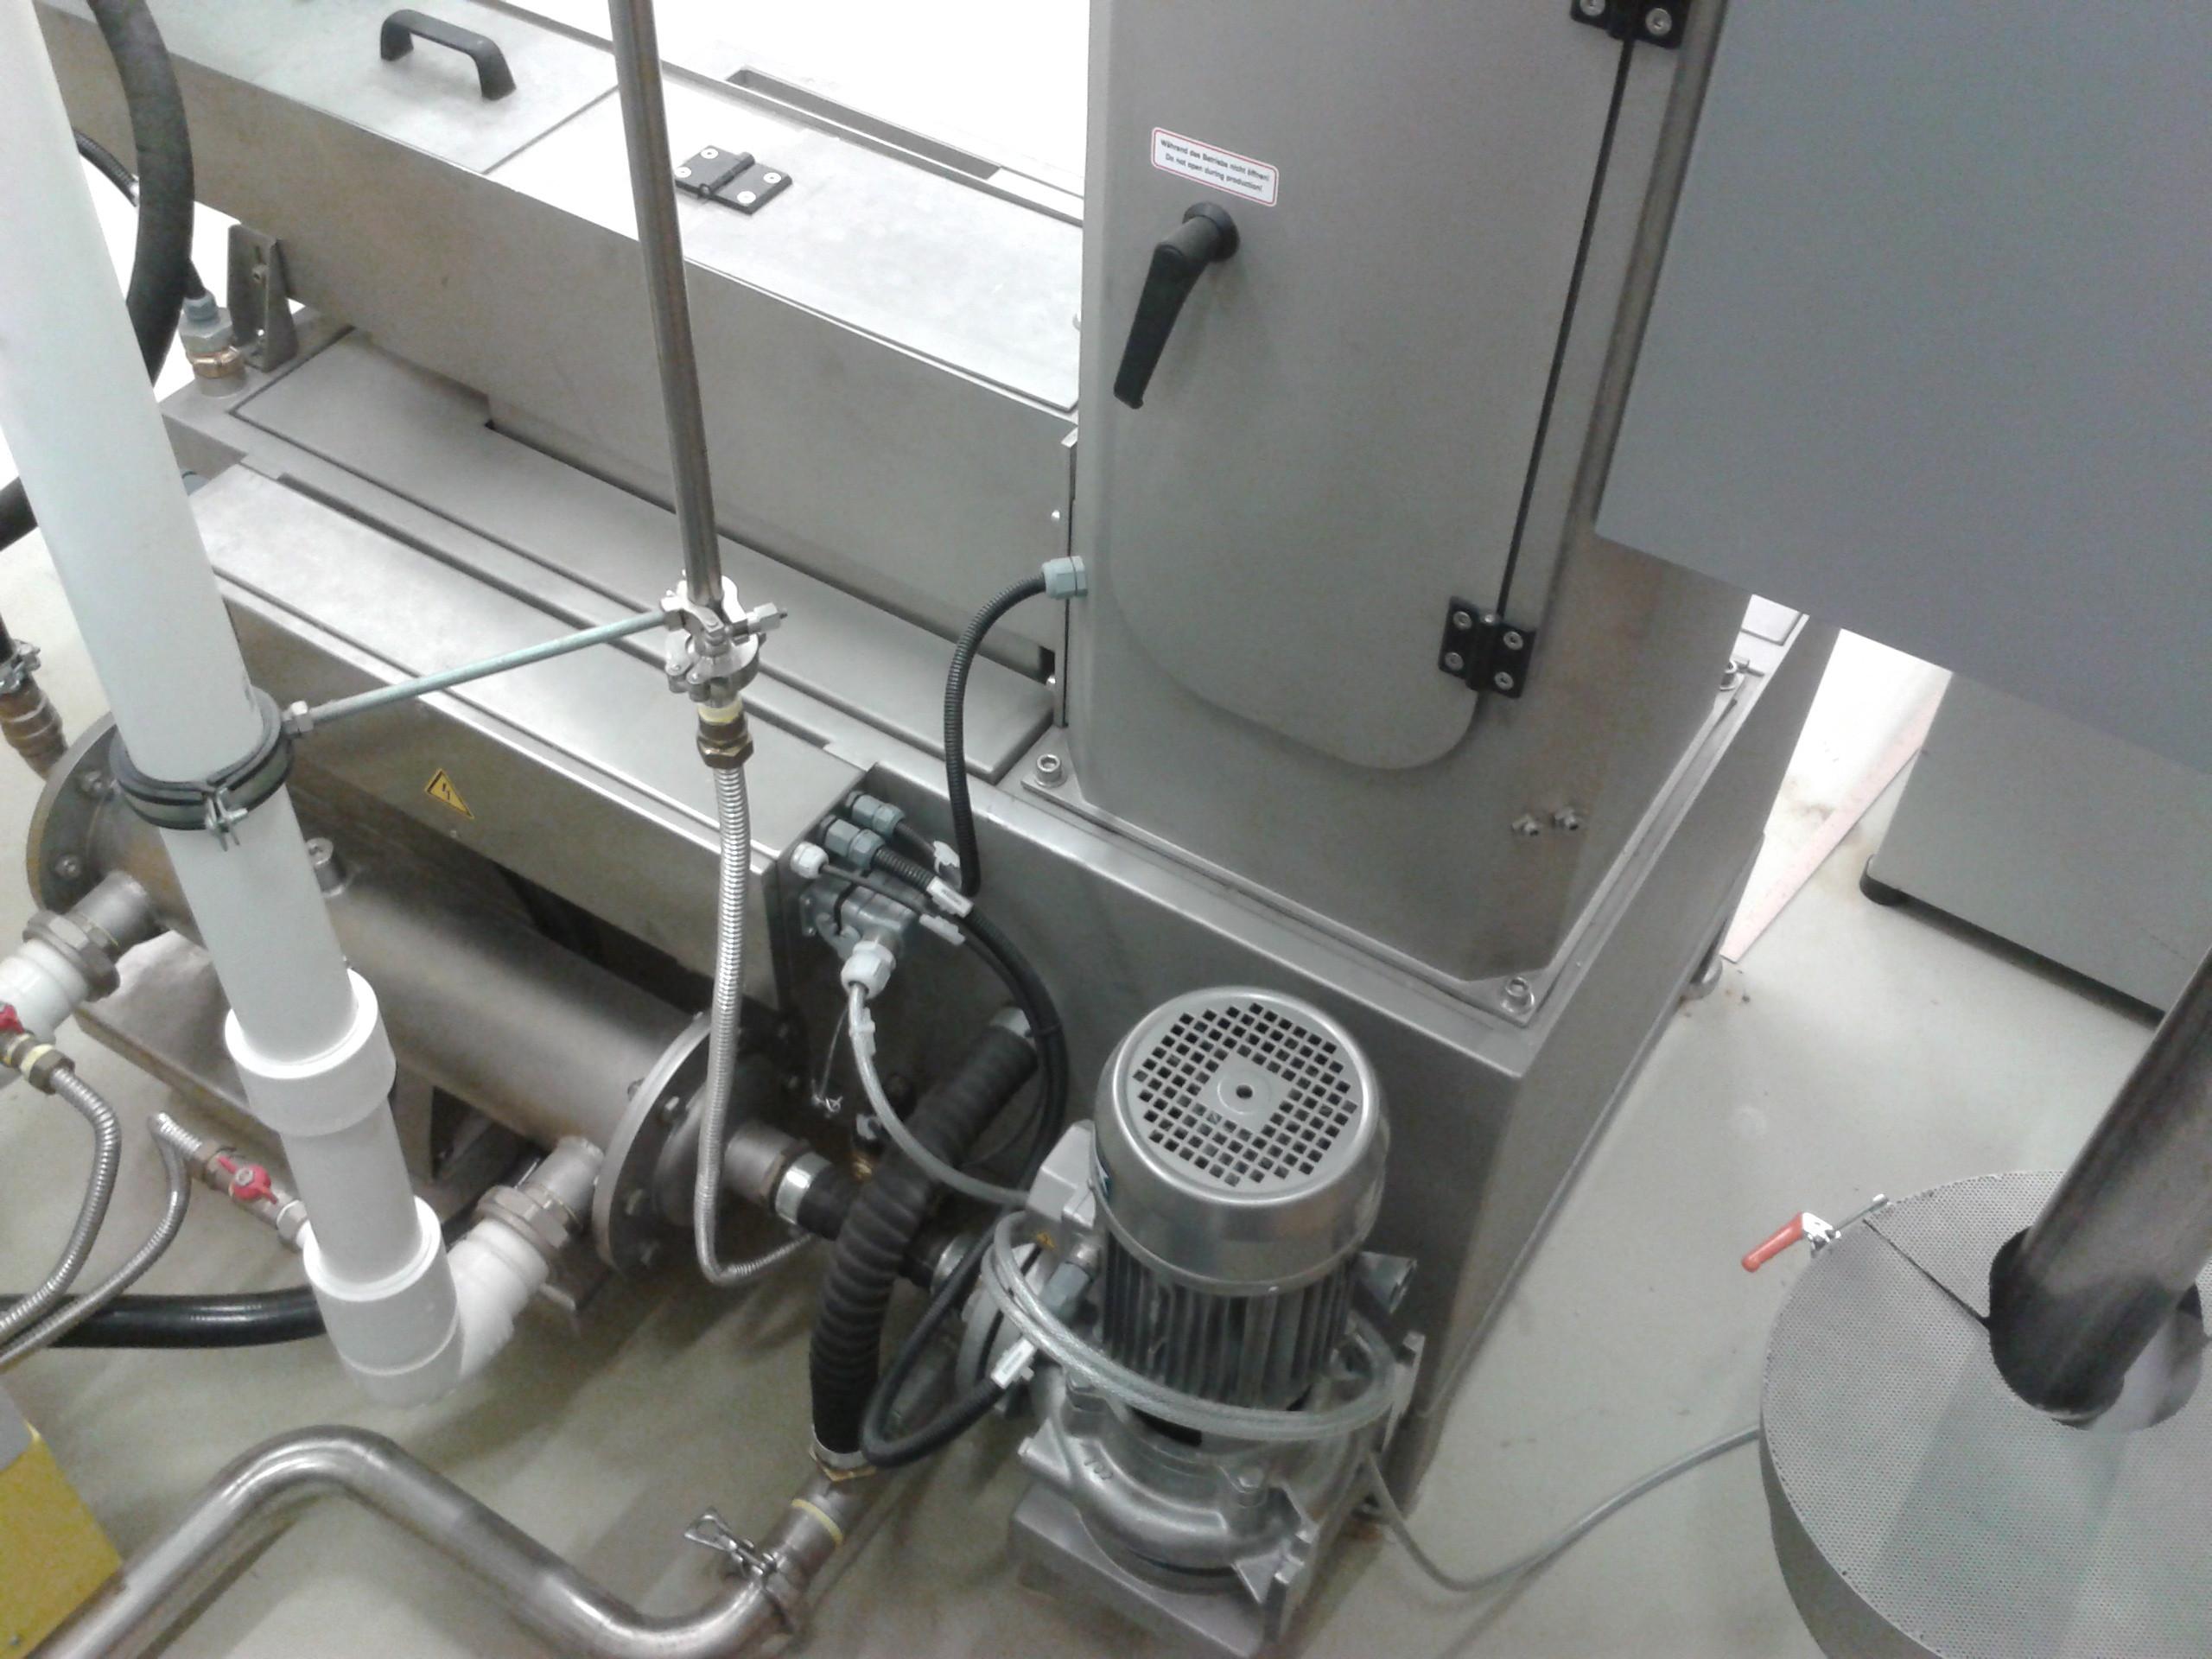 machine de recyclage plastique ngr a gran 65 40 hd machines d 39 occasion exapro. Black Bedroom Furniture Sets. Home Design Ideas